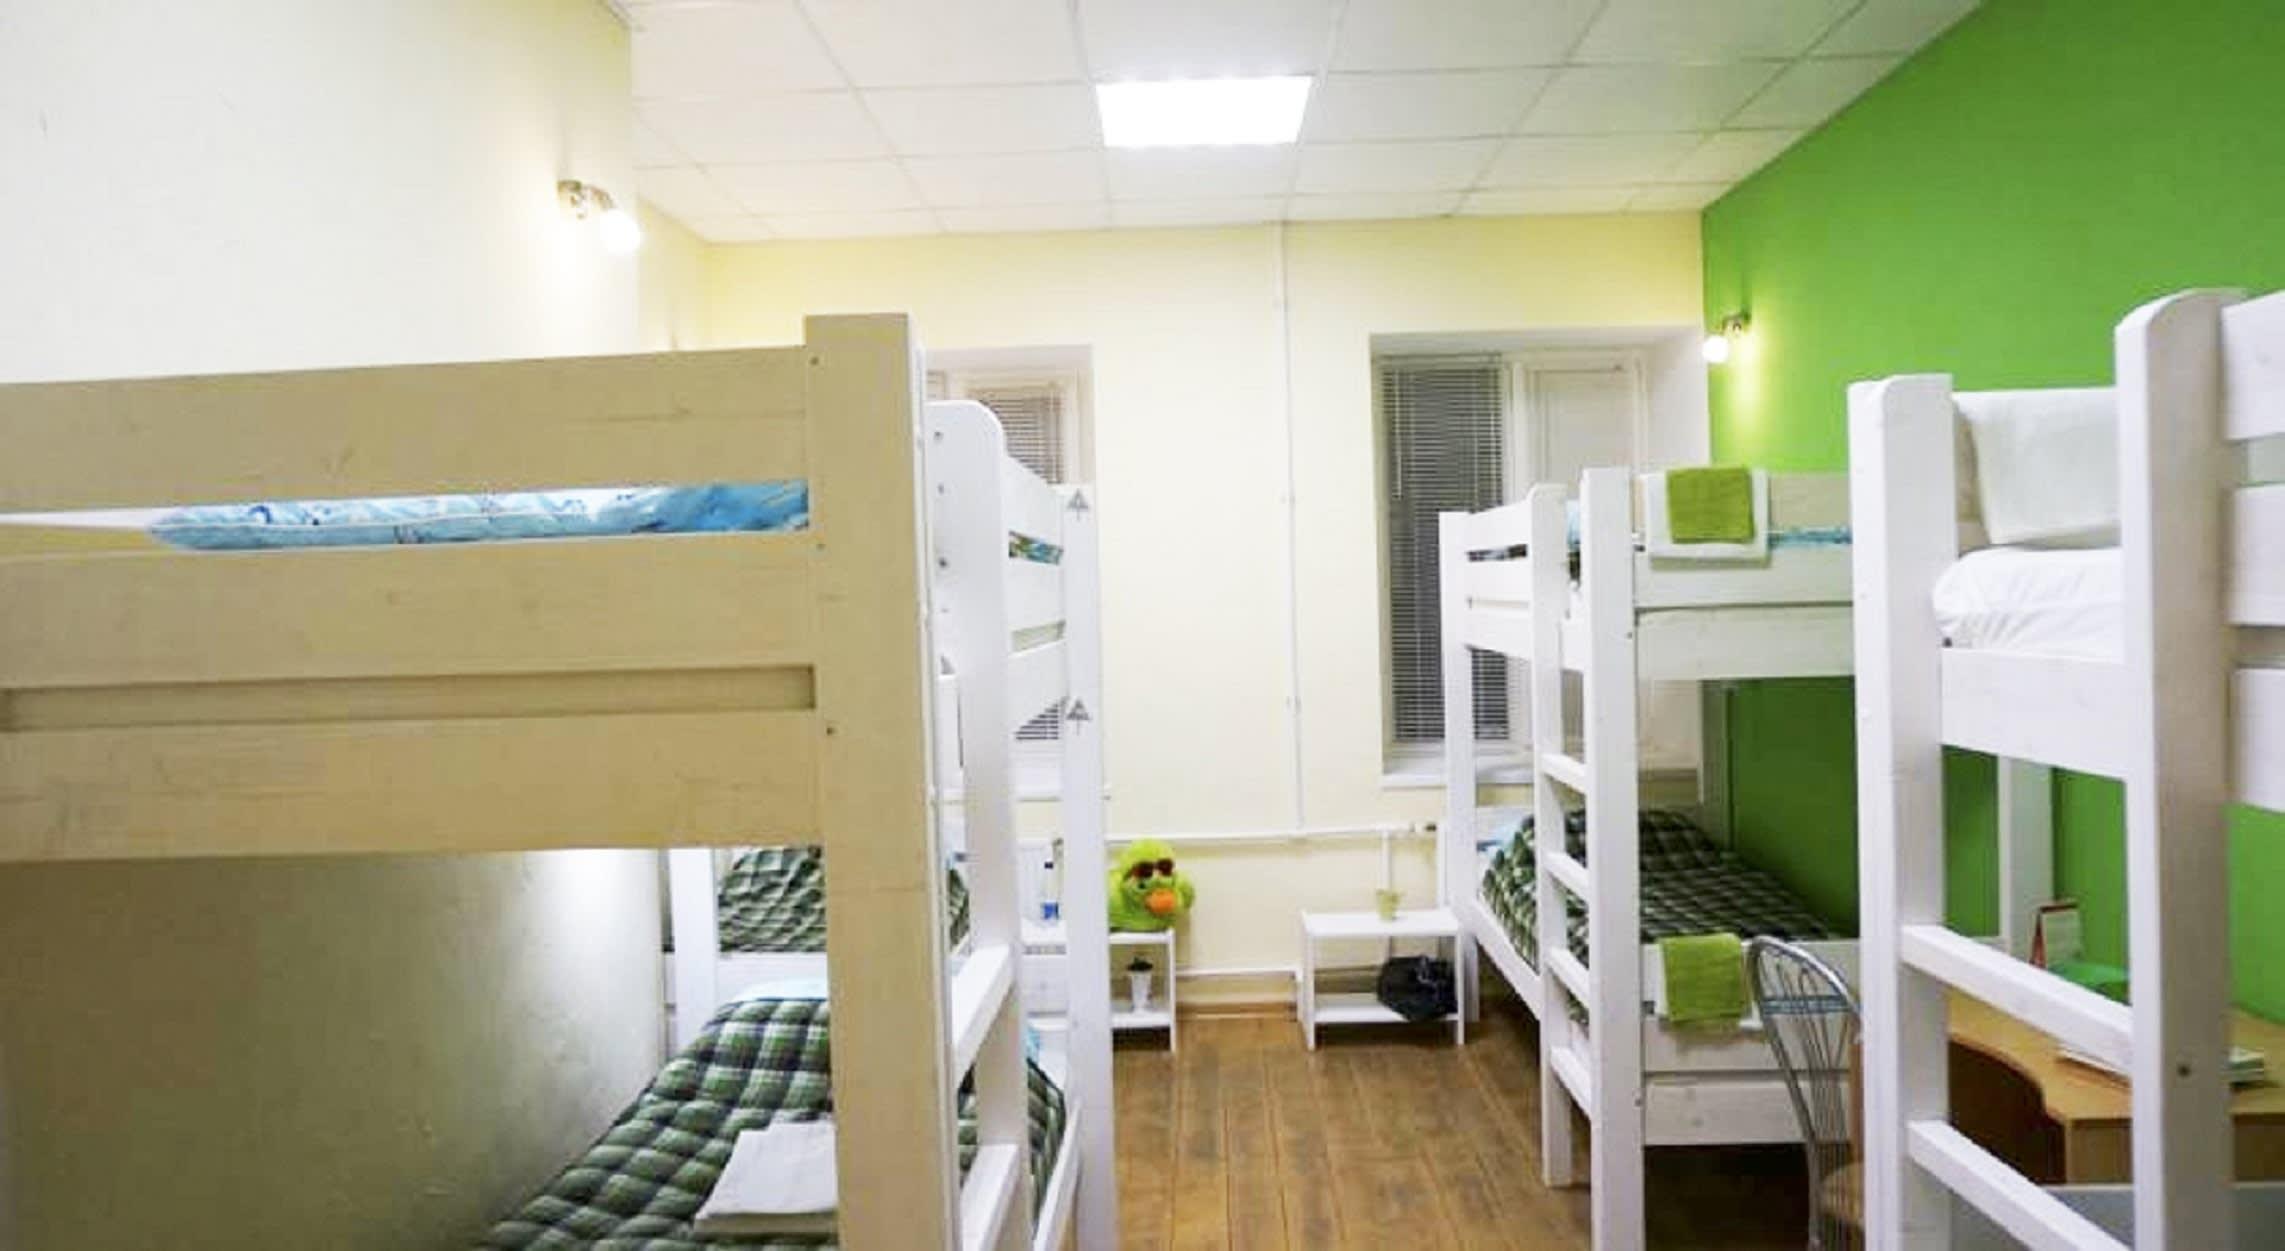 HOSTEL - Hostel CityLime (Хостел CityLime)